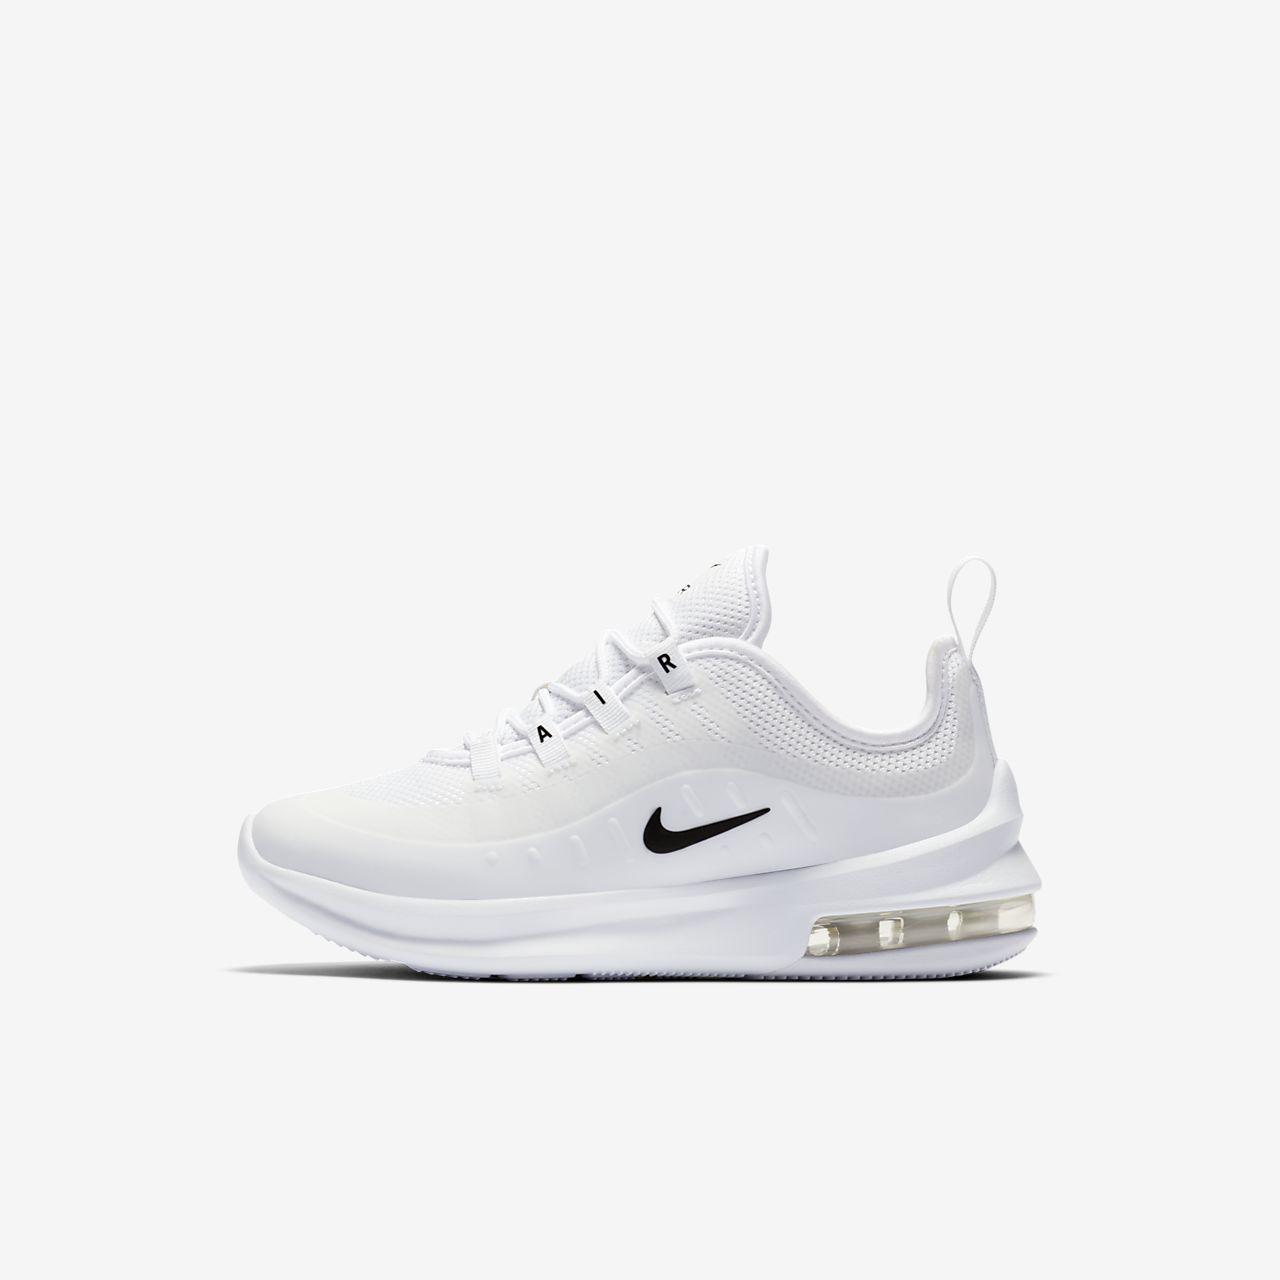 Chaussure Nike Air Max Axis pour Jeune enfant